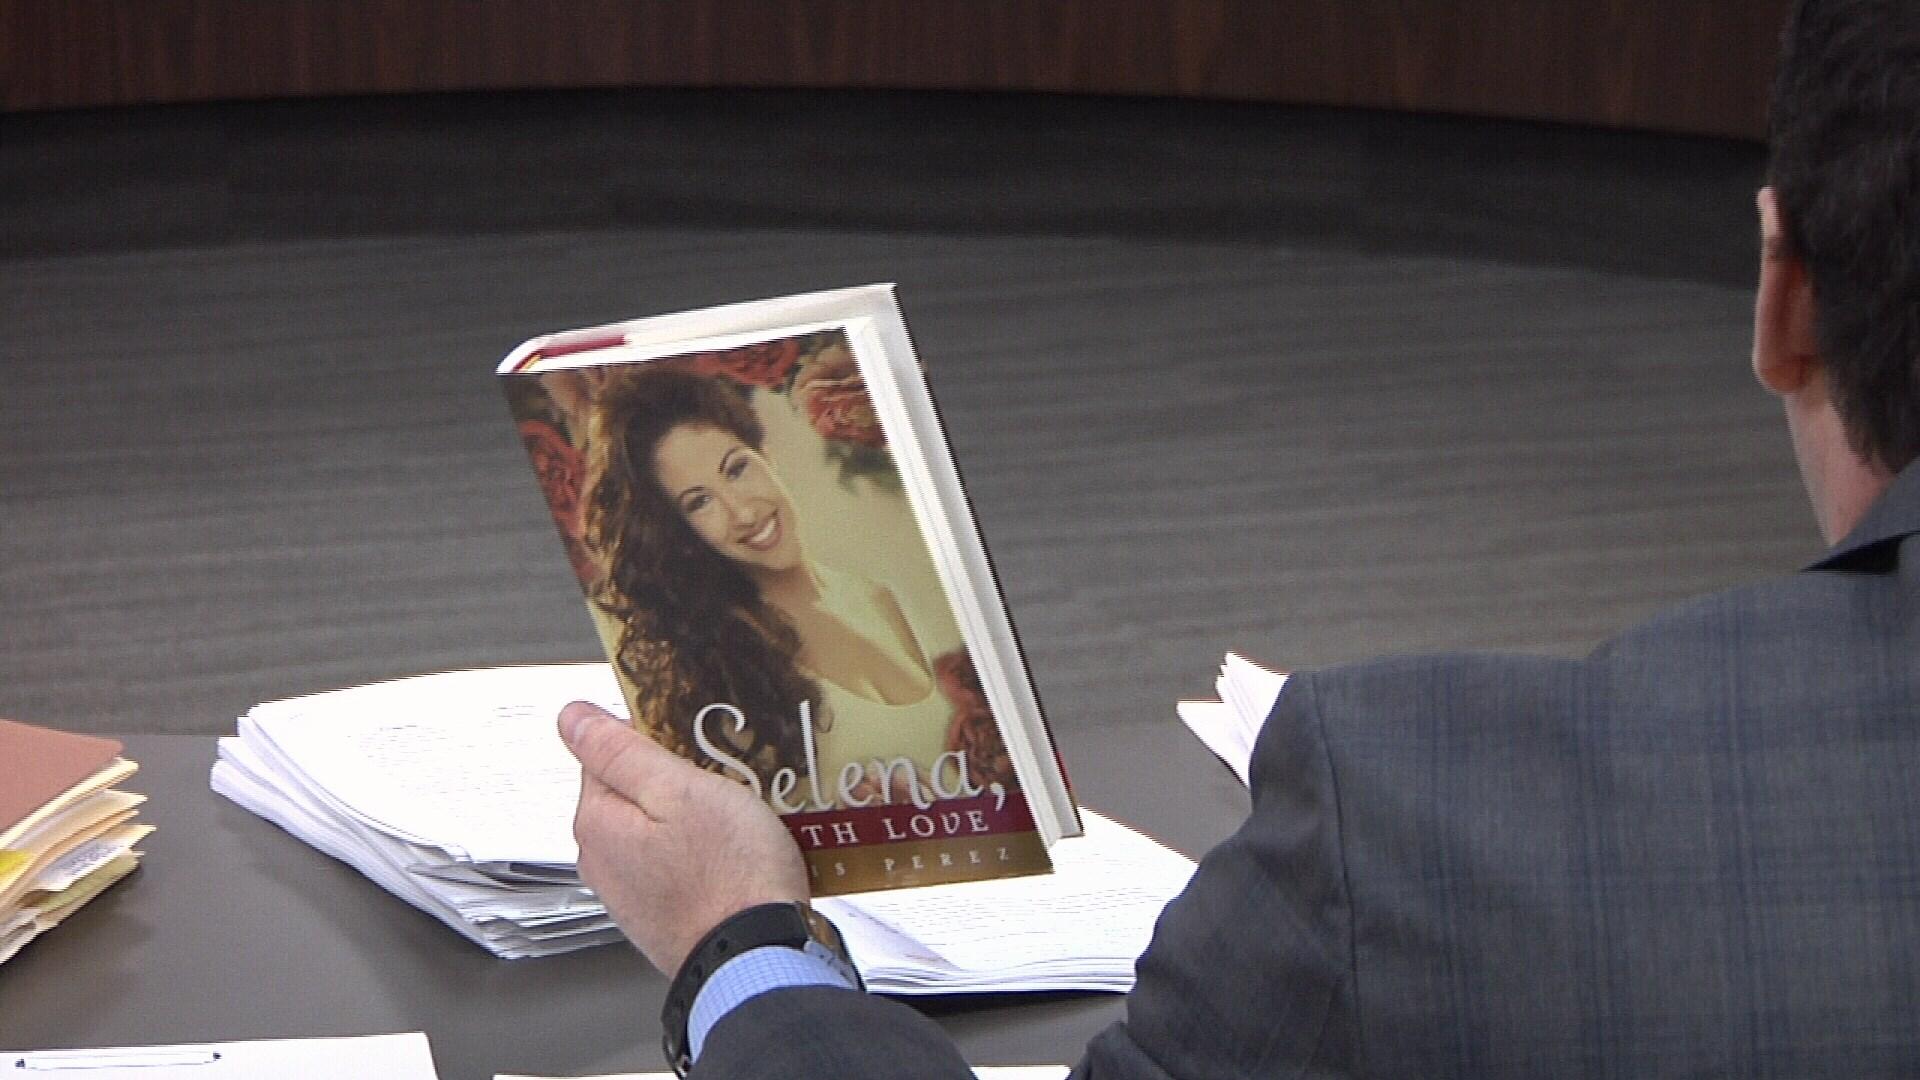 Selena lawsuit moving forward - KZTV10.com | Continuous News Coverage | Corpus Christi